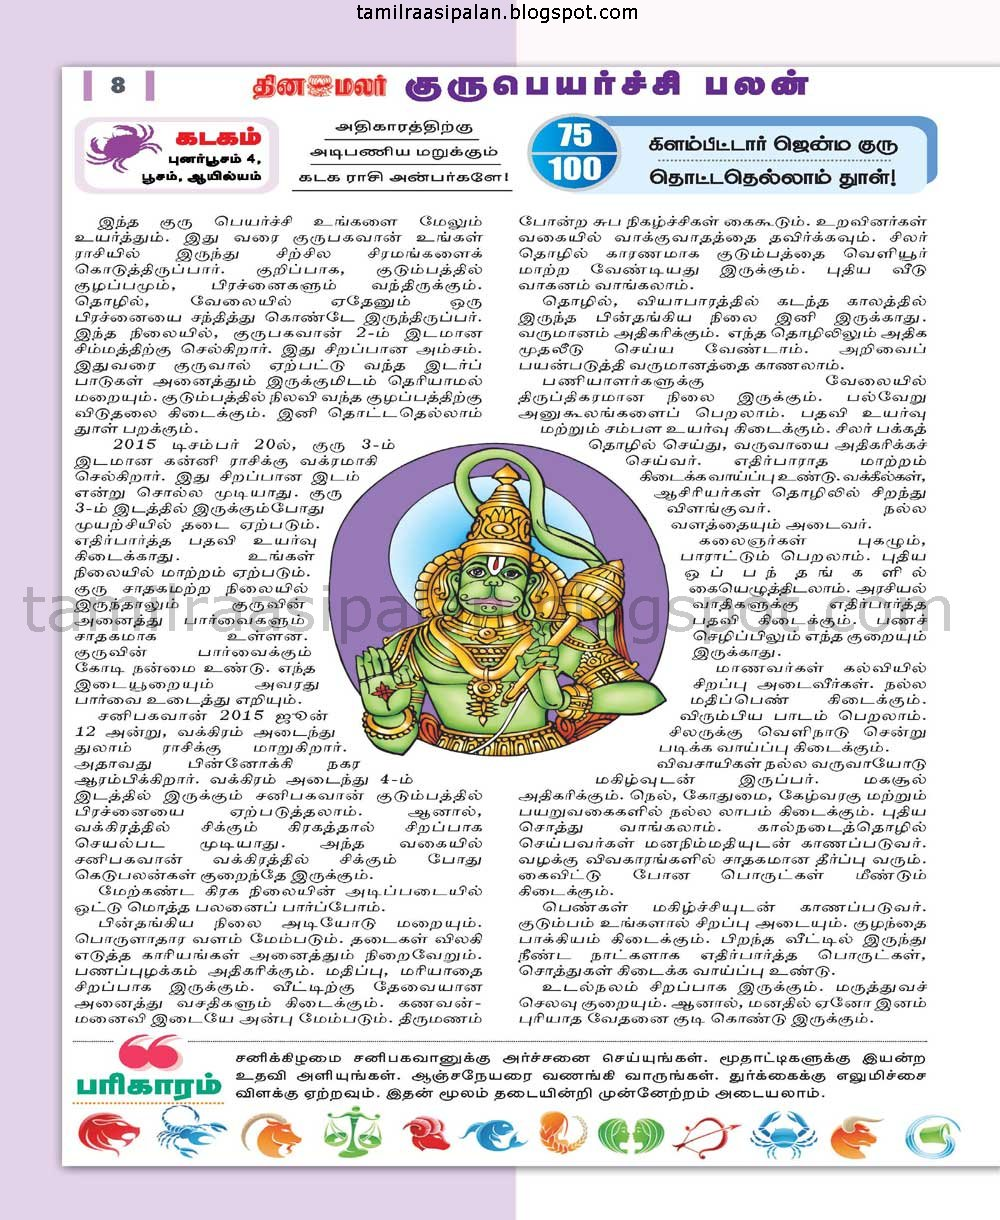 Dinamalar guru peyarchi predictions 2015 2016 kaliyoor narayanan raasi palan